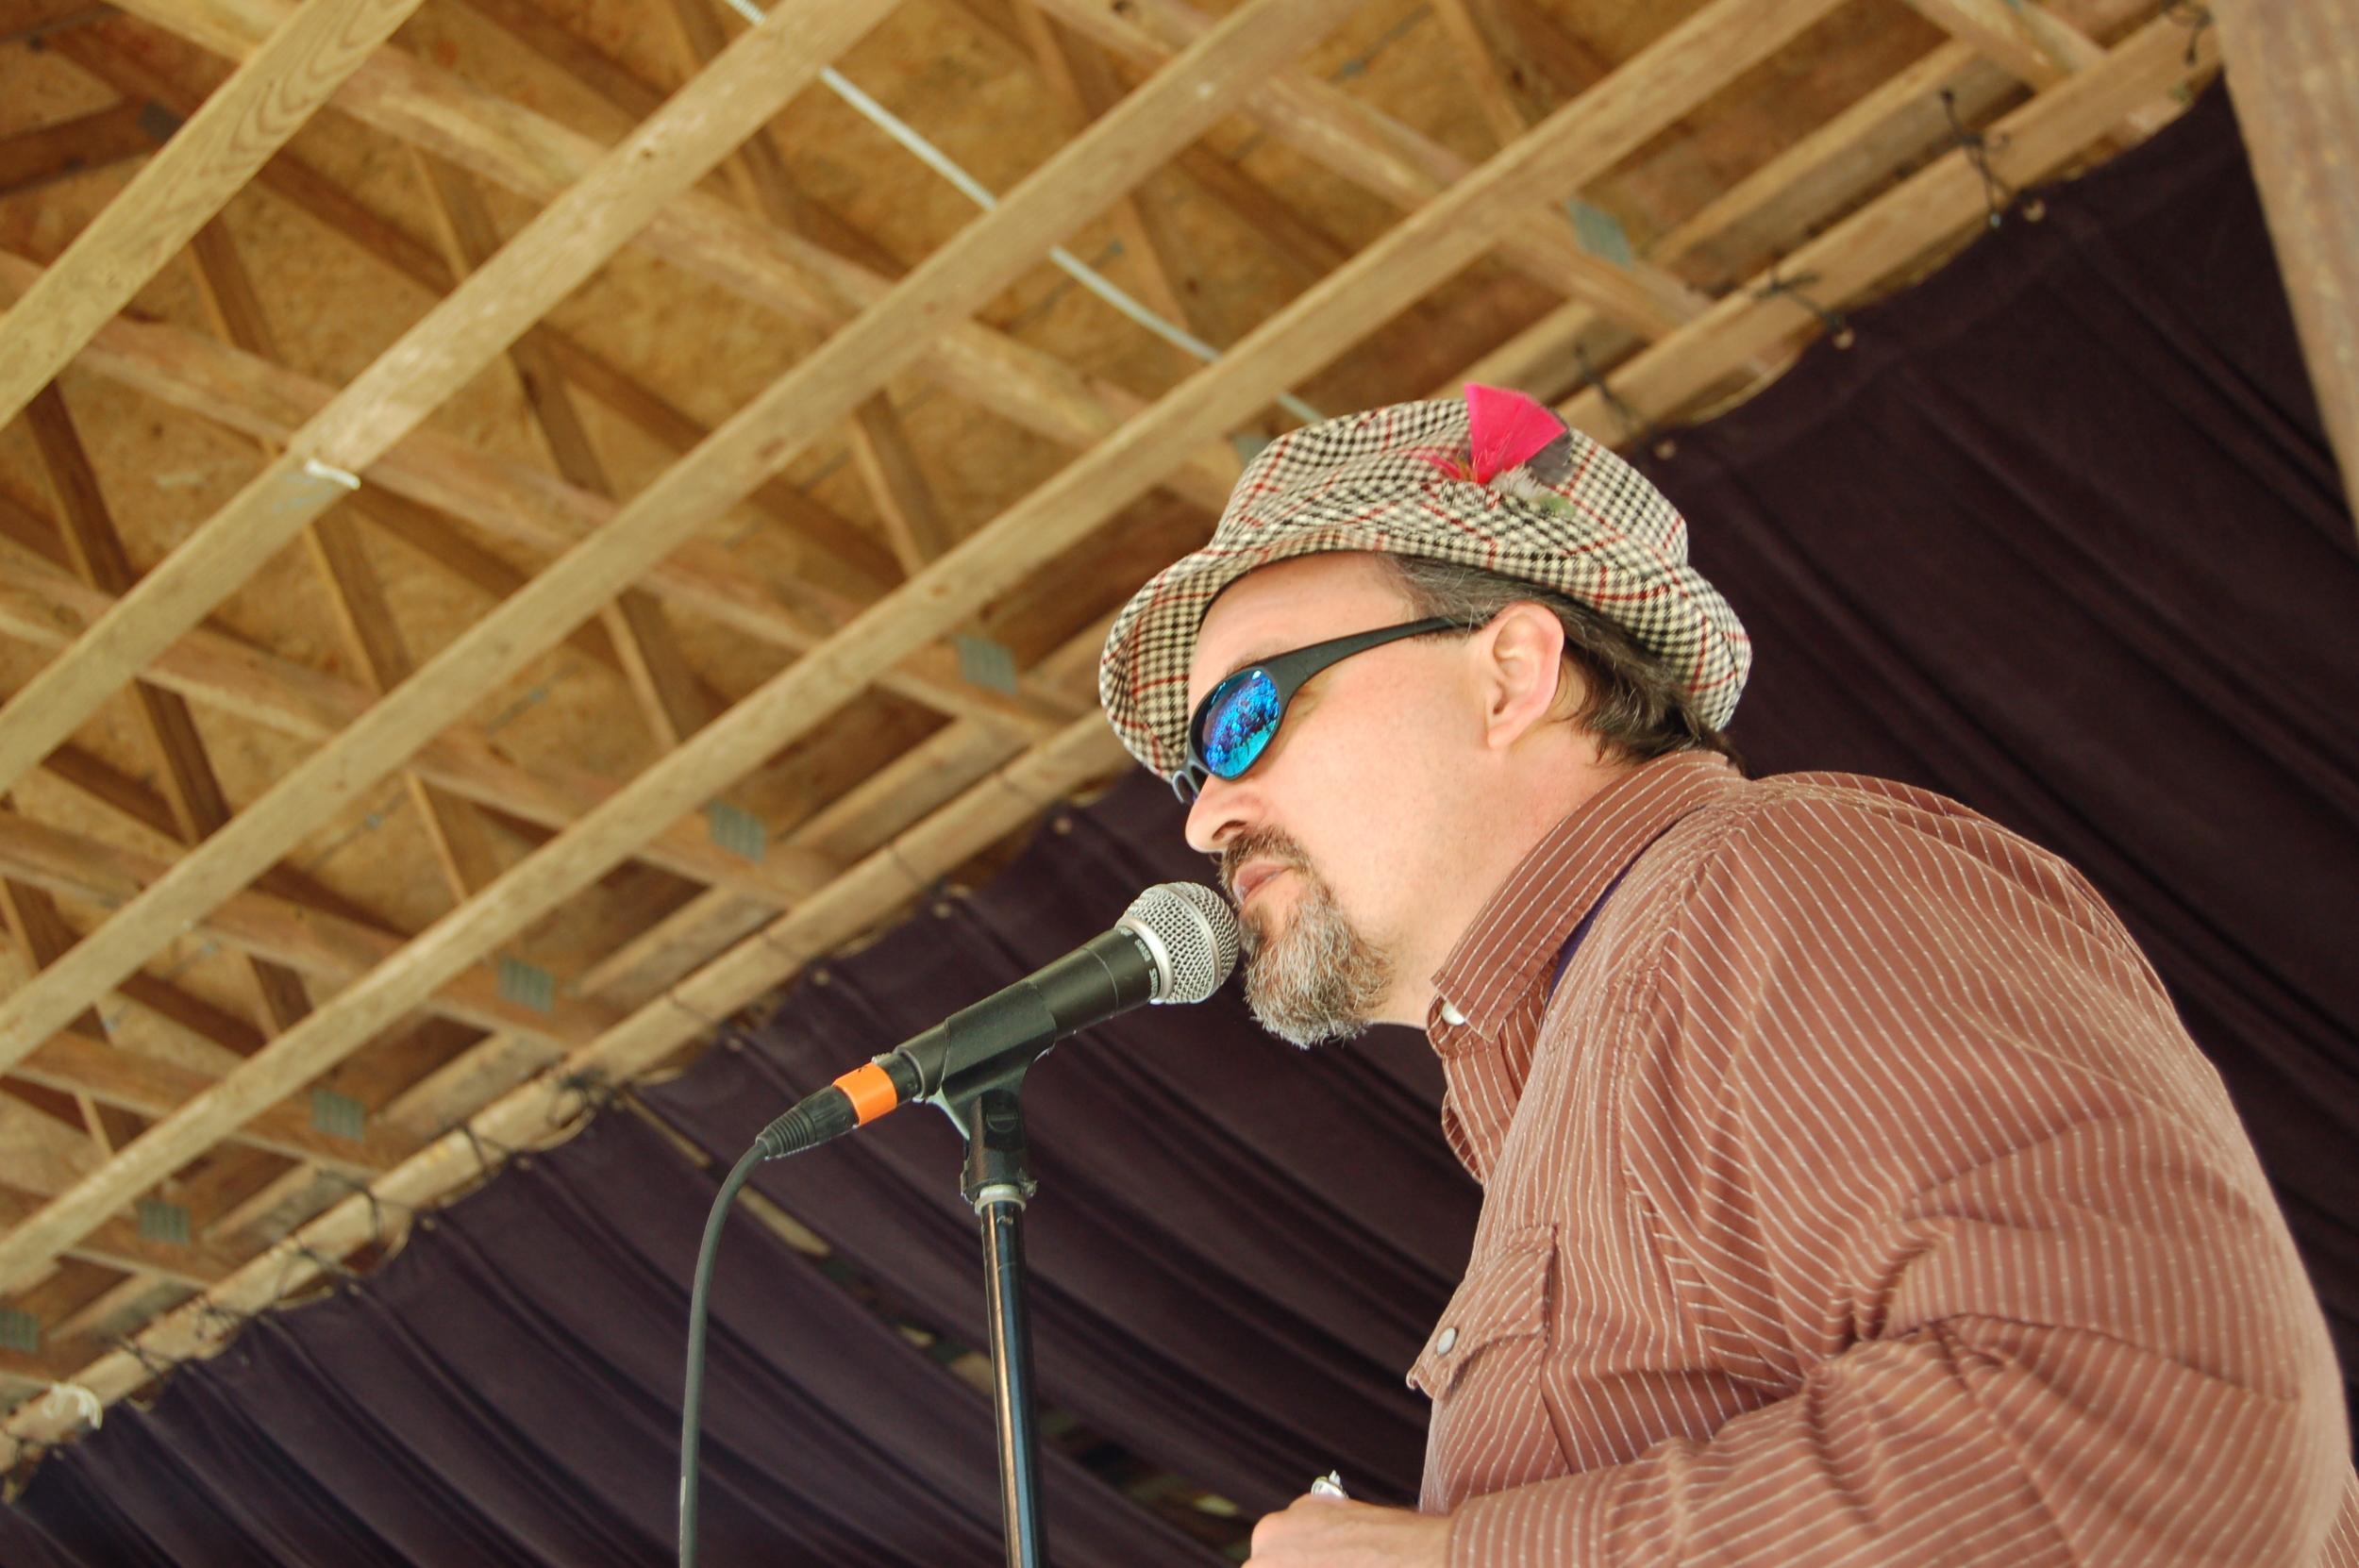 Joe Kendrick at MerleFest 2013. Photo by Jeff Eason.